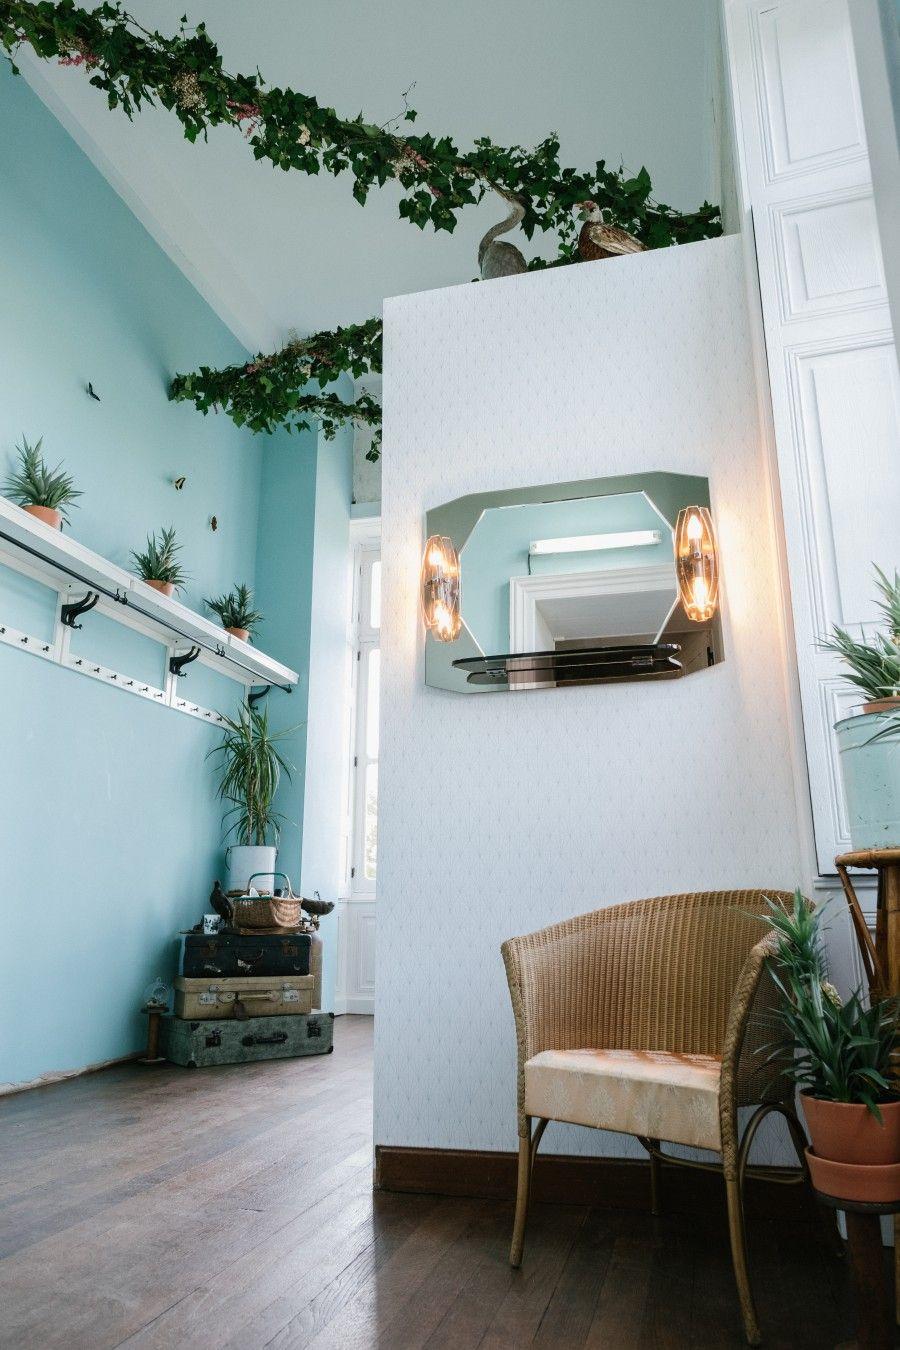 Dscf1295 Interiors Dream Angel Adoree French House